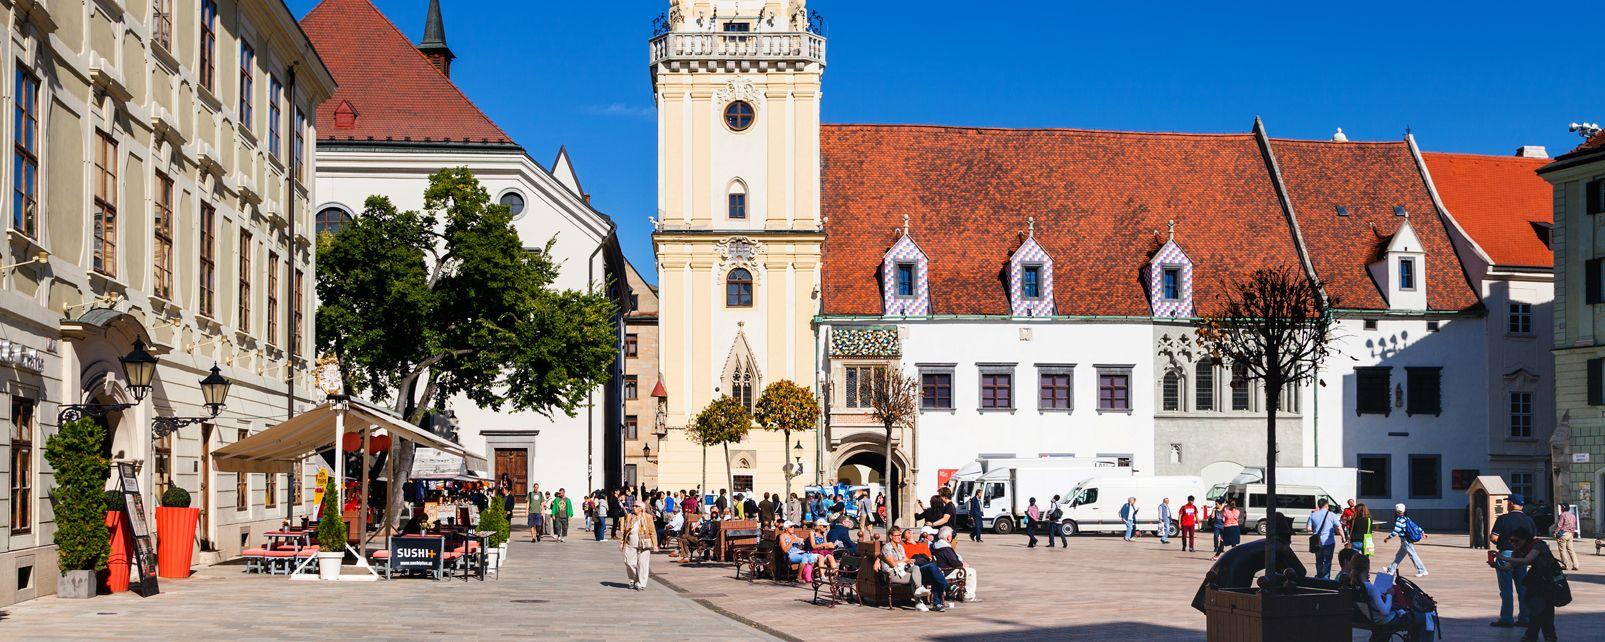 Bratislava City Museum, Bratislava's city museum, Arts and culture, Slovakia